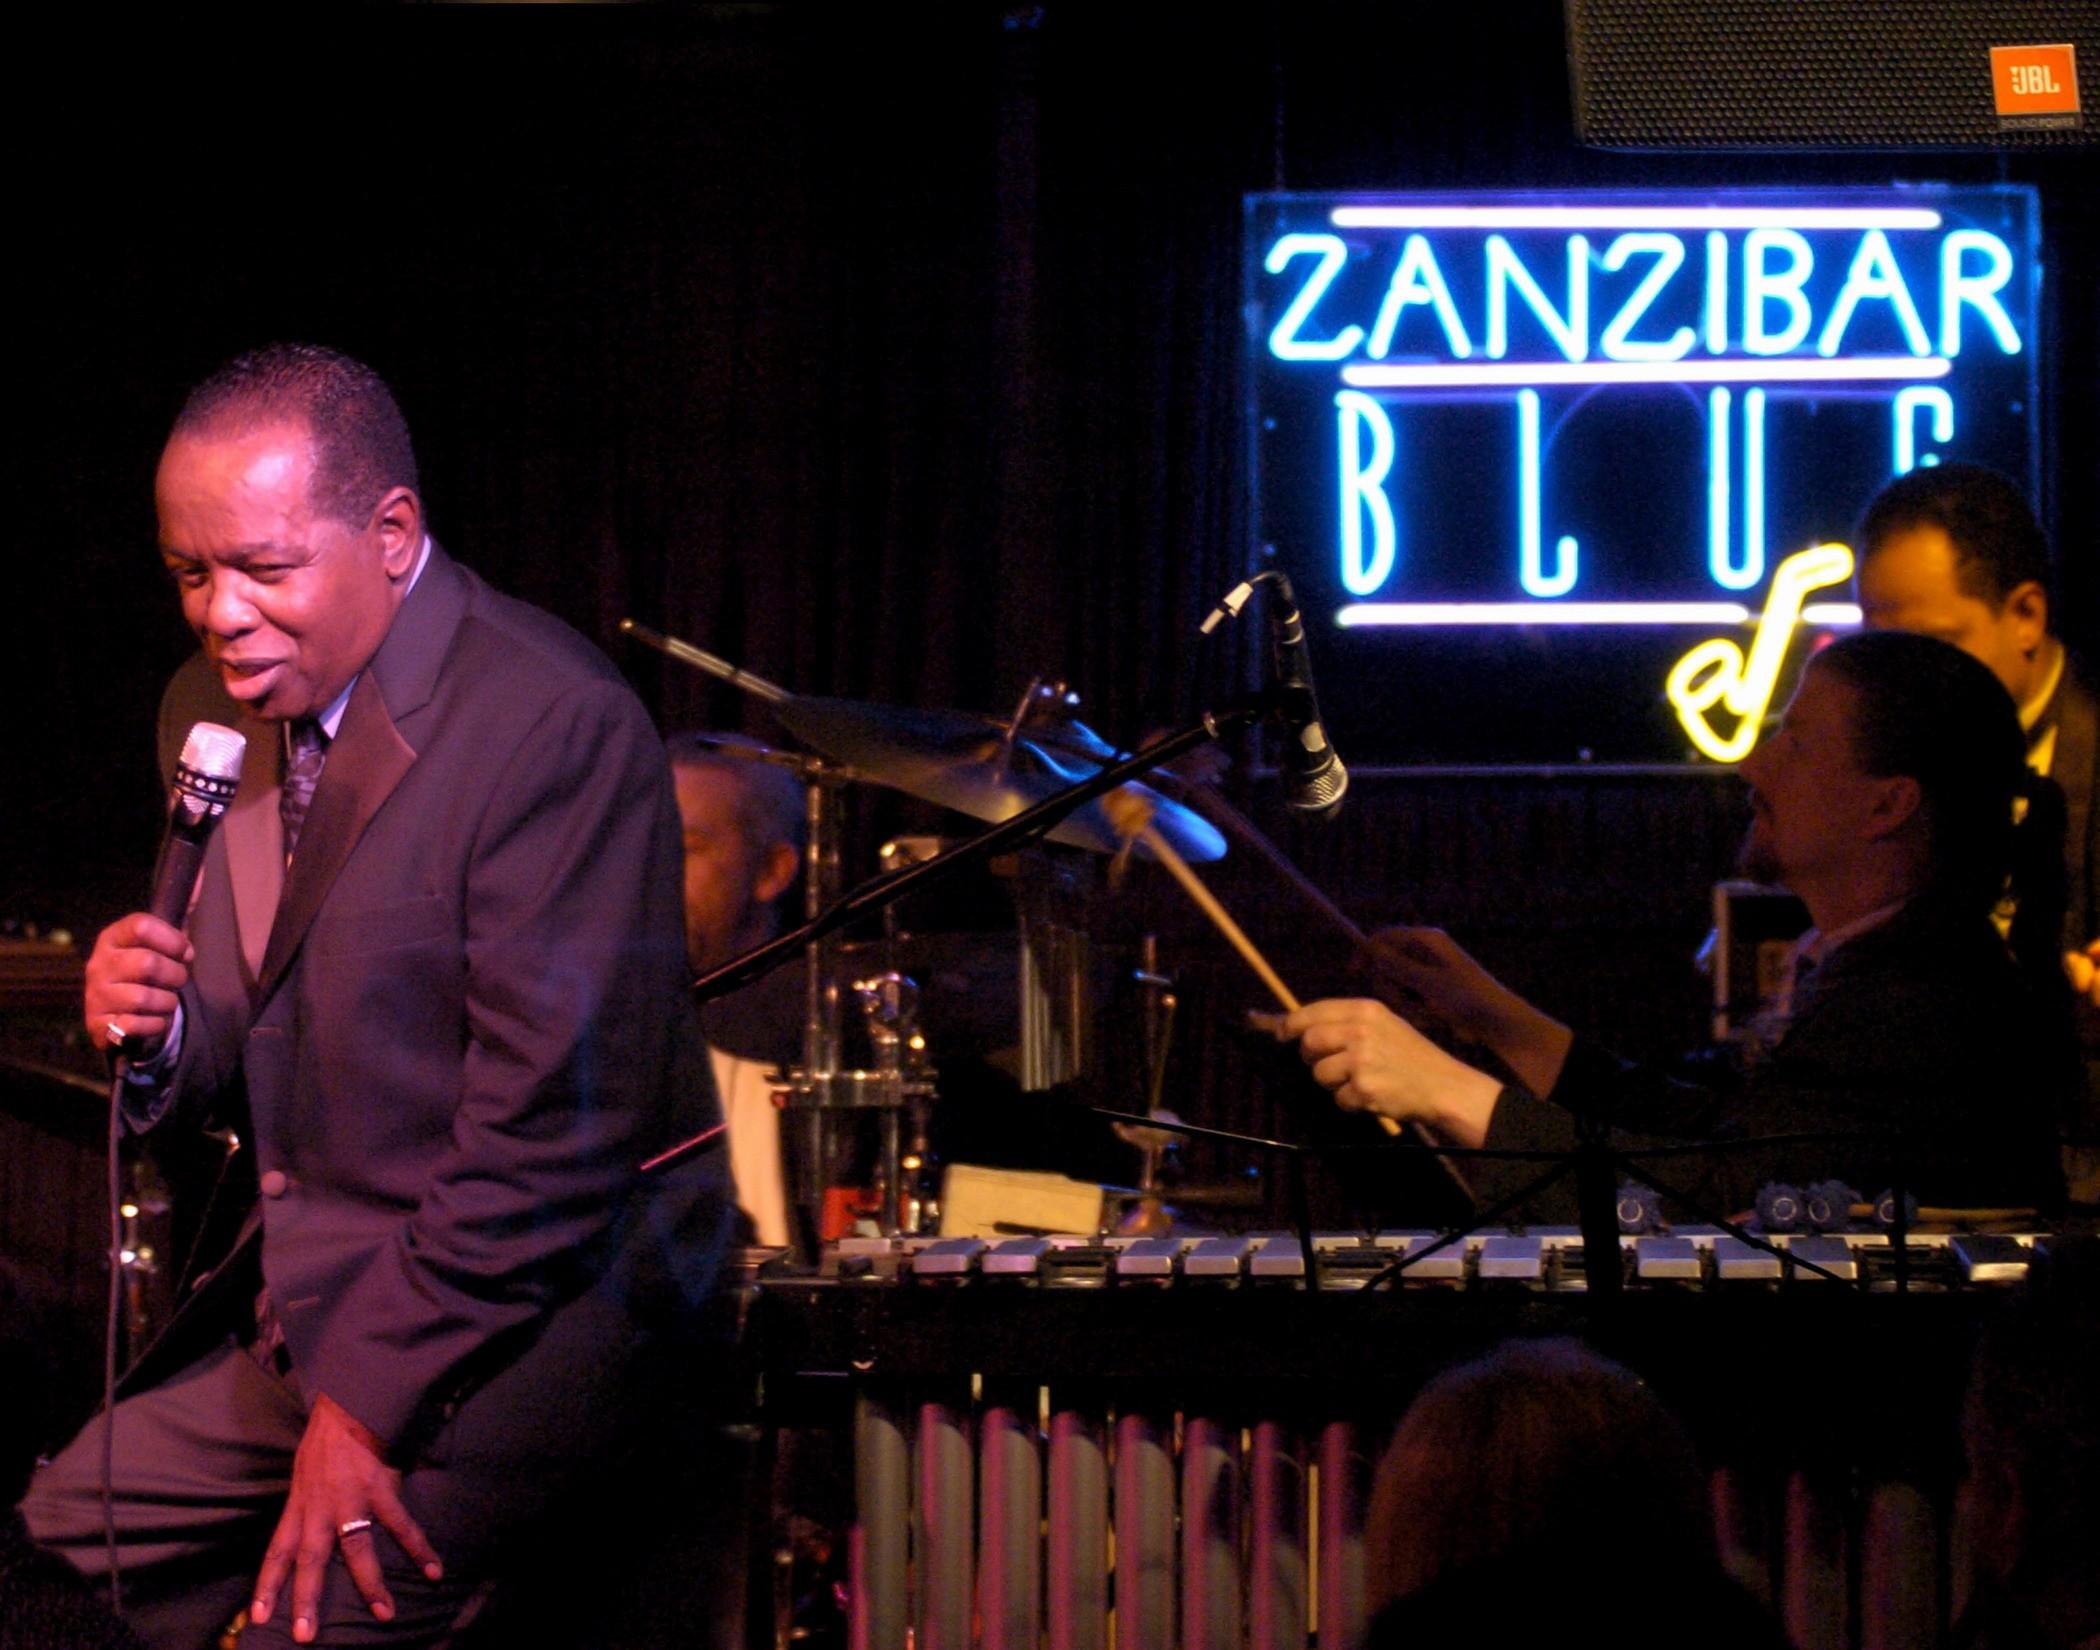 Lou Rawls (Zanzibar 3-26-04)